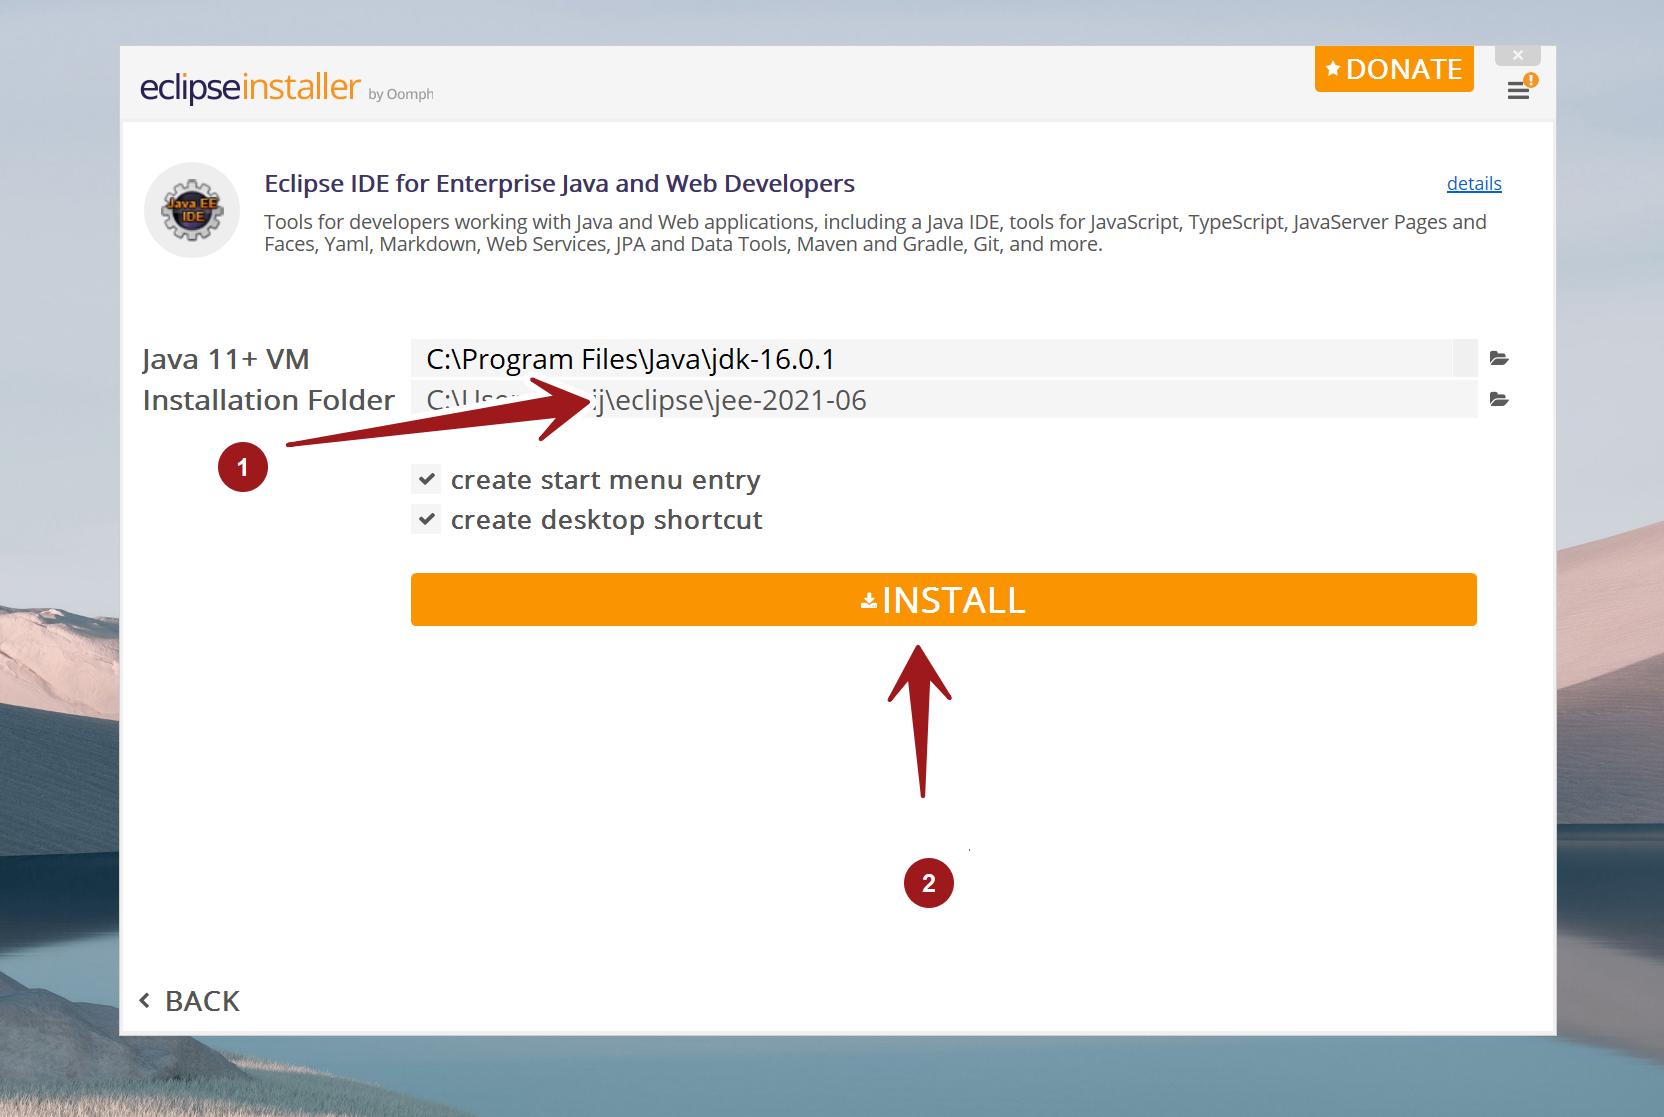 Eclipse Installer Install Button